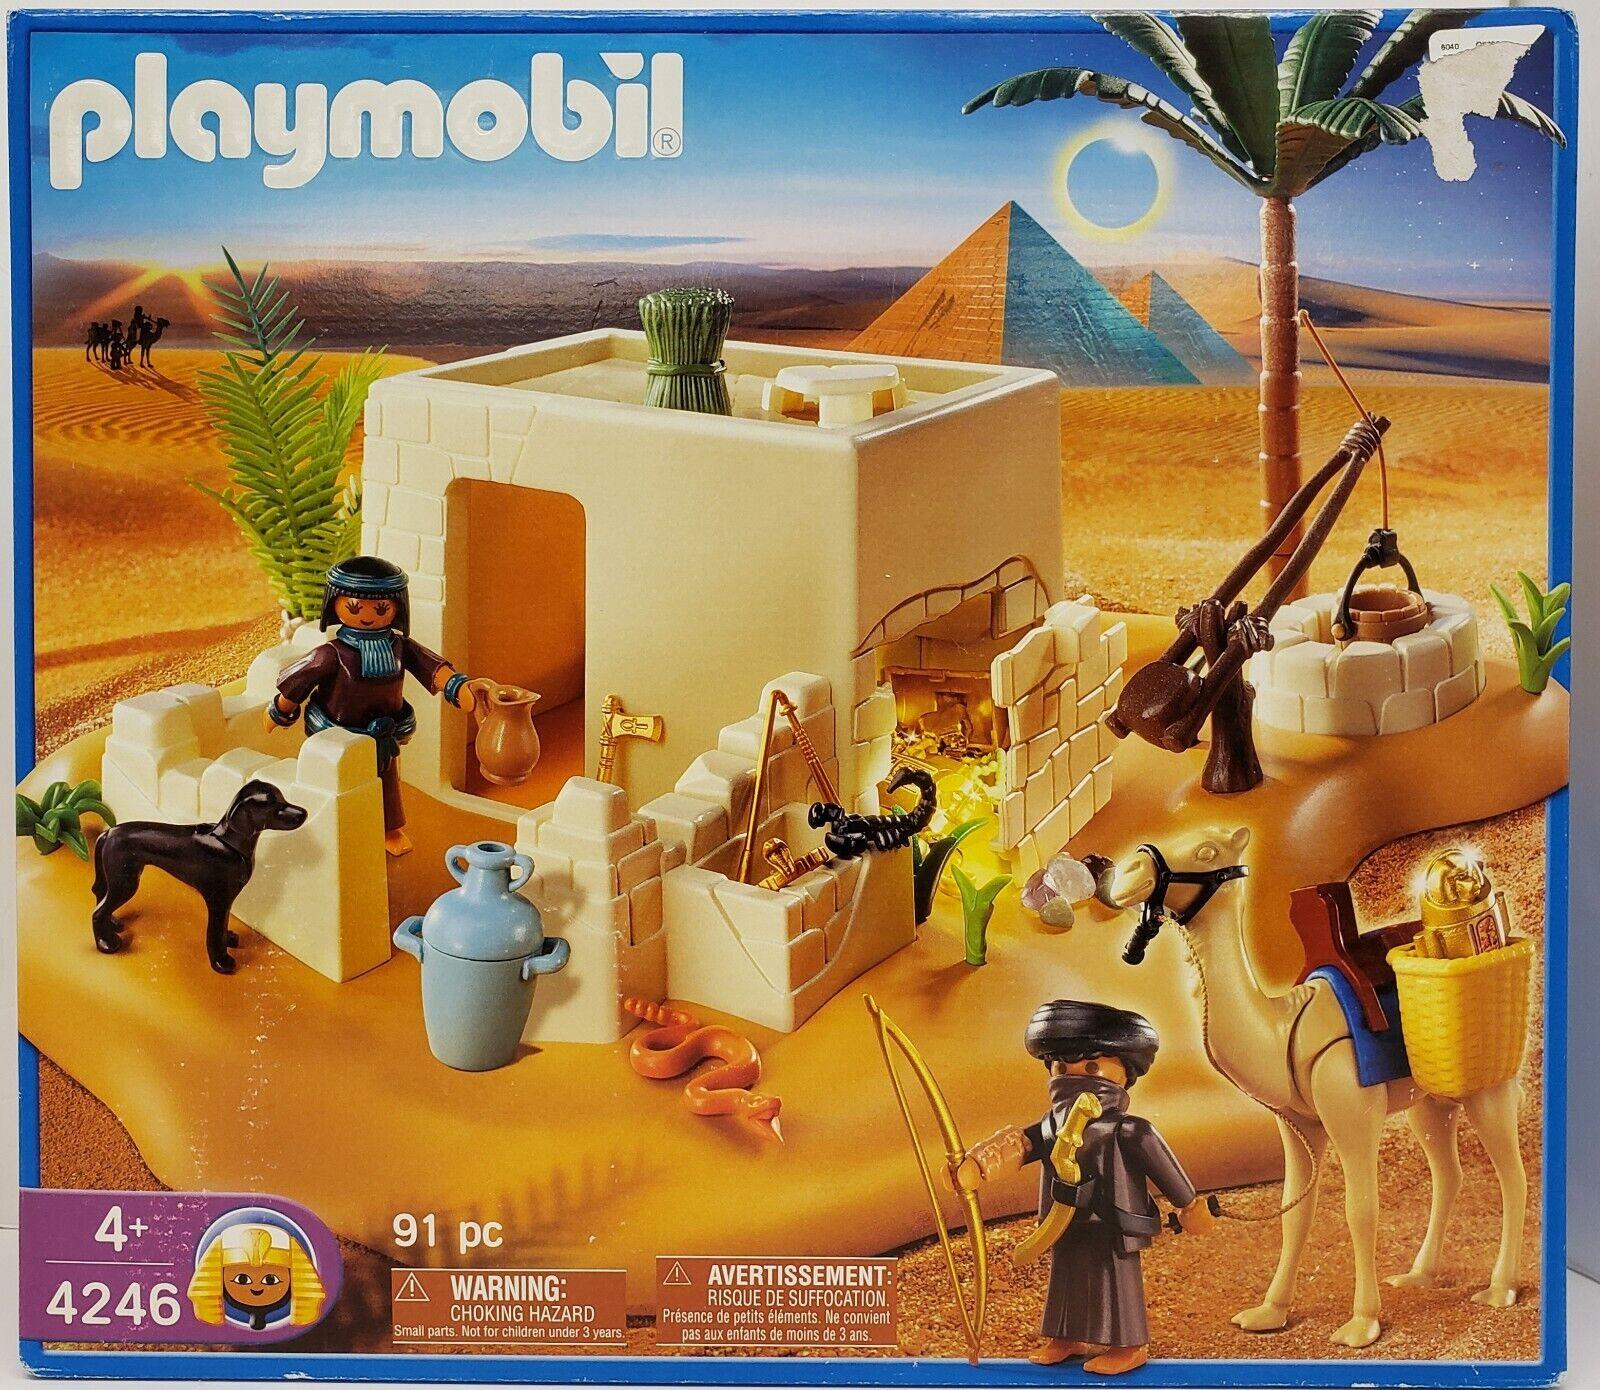 2009 PLAYMOBIL 91 PIECE EGYPTIAN  4246 PLAY SETNEW & SEALEDMADE GERMANY